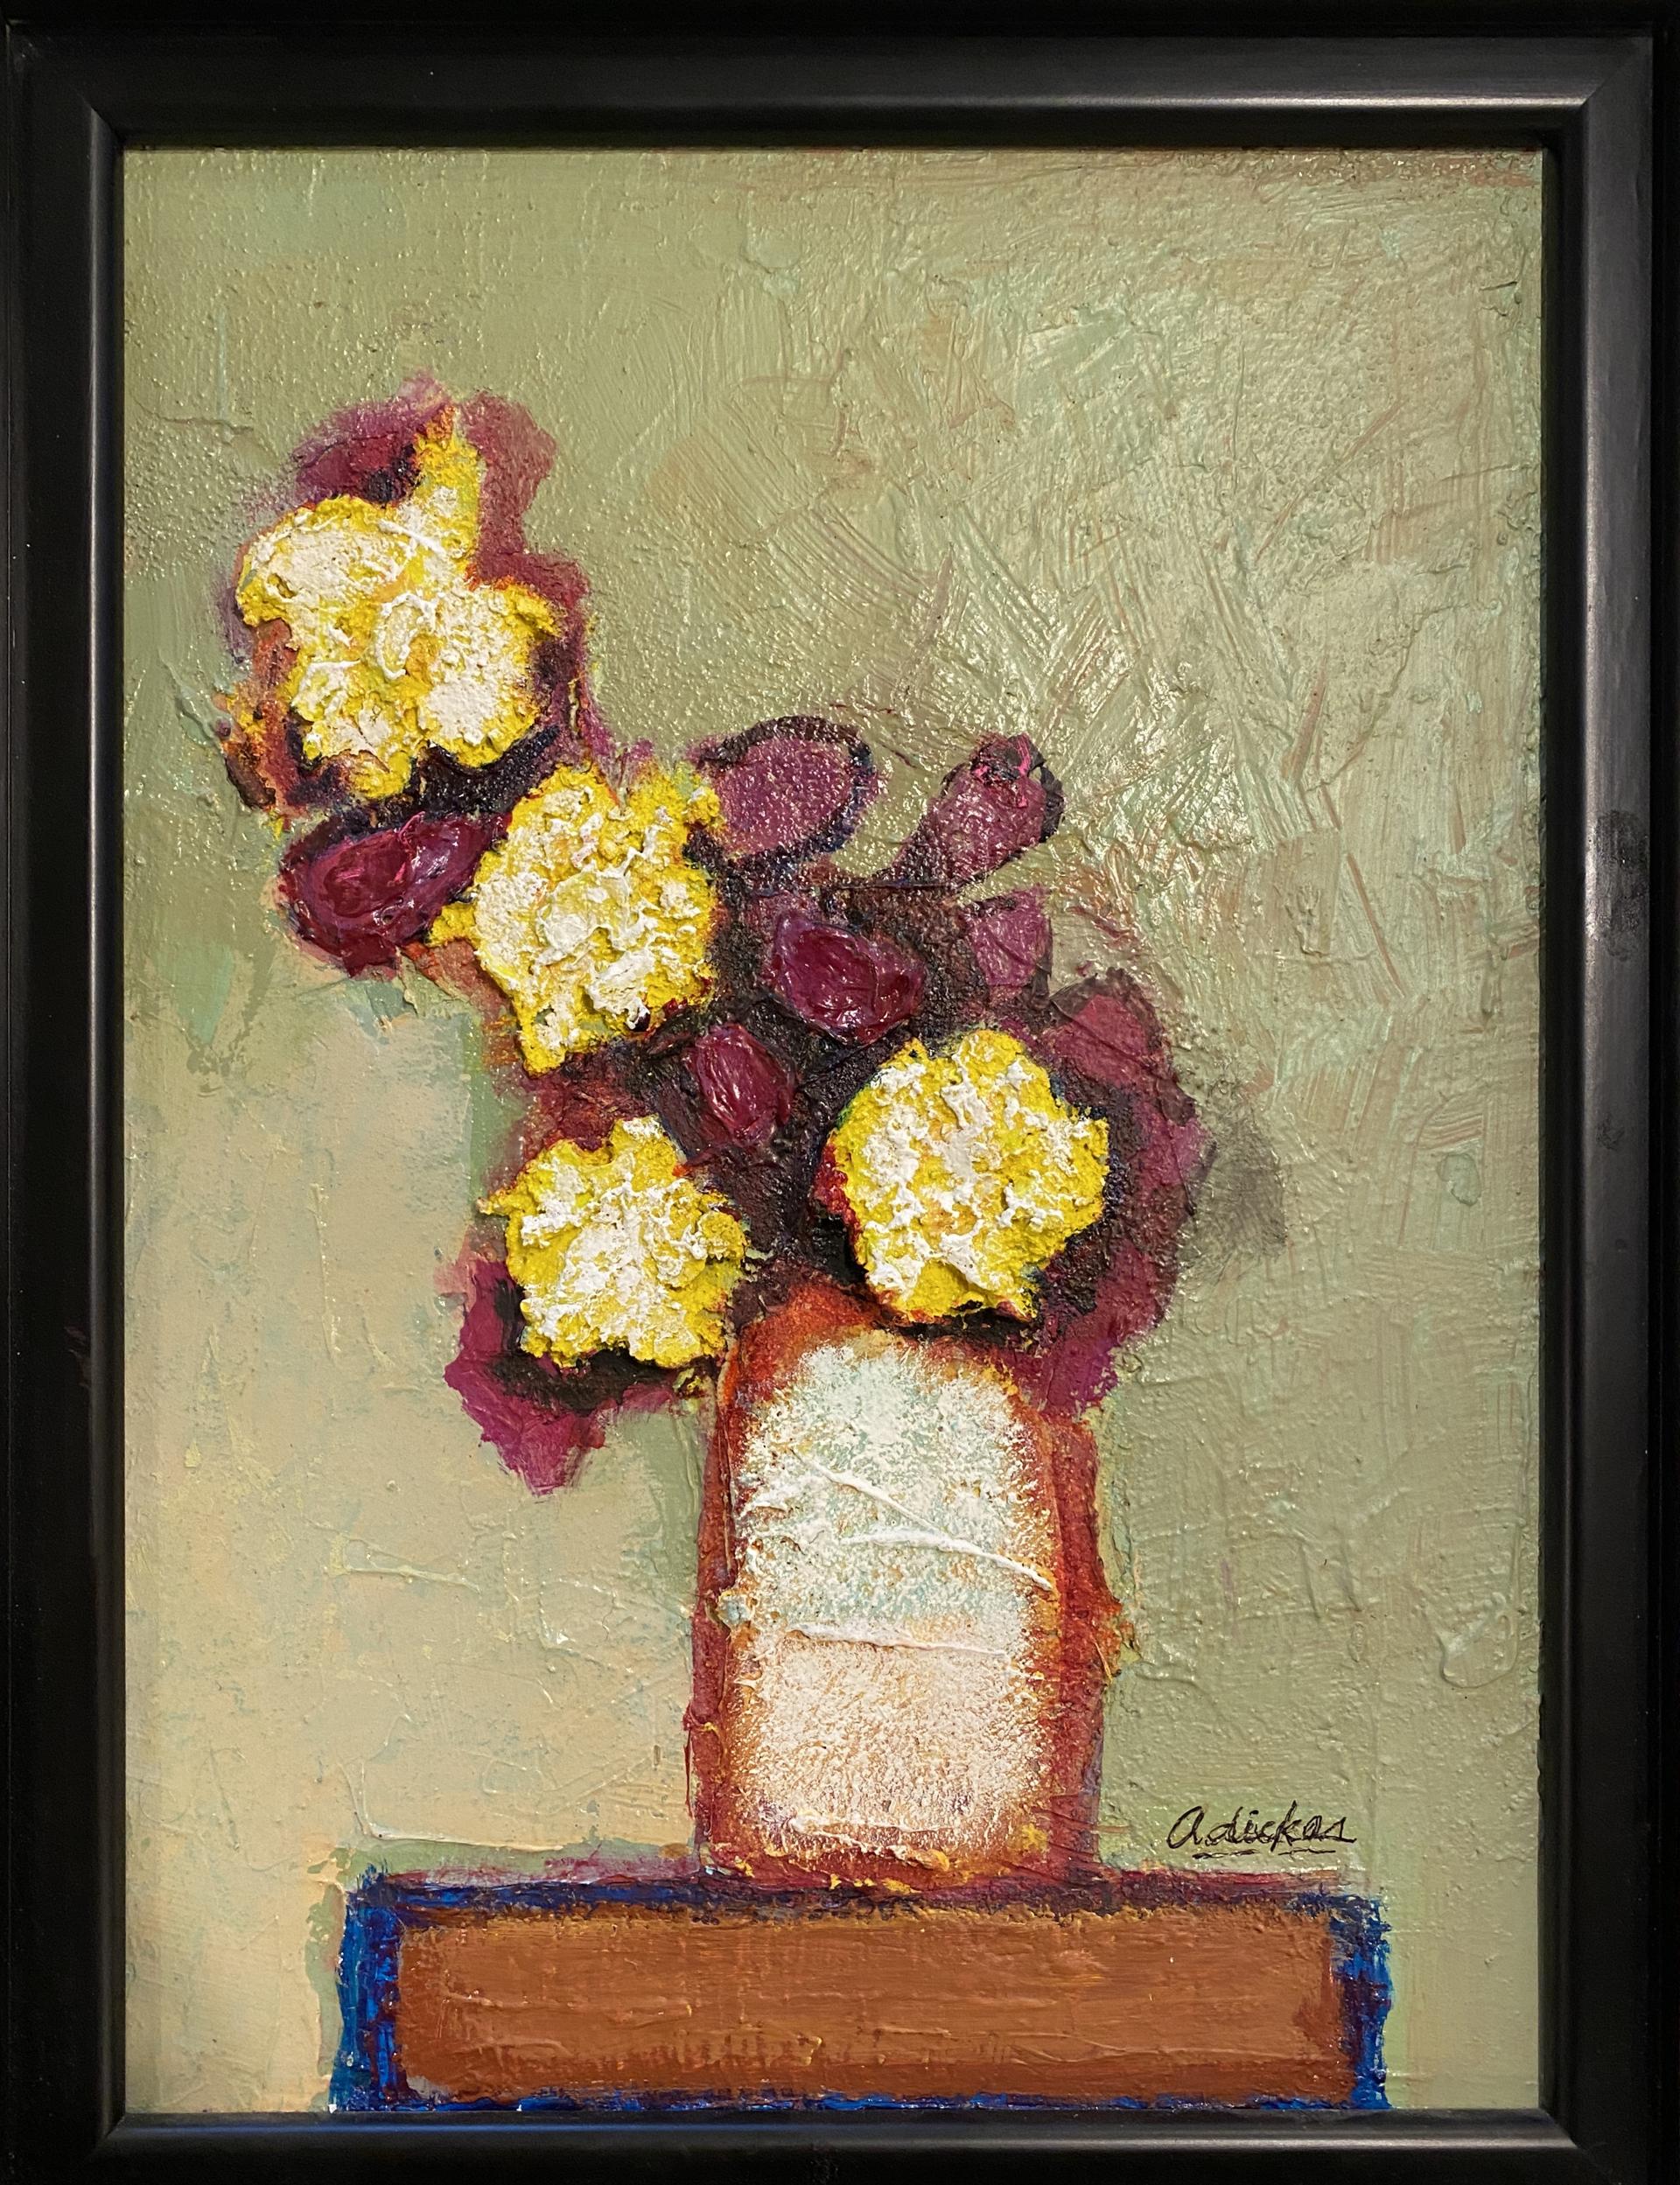 Four Yellow Flowers by David Adickes